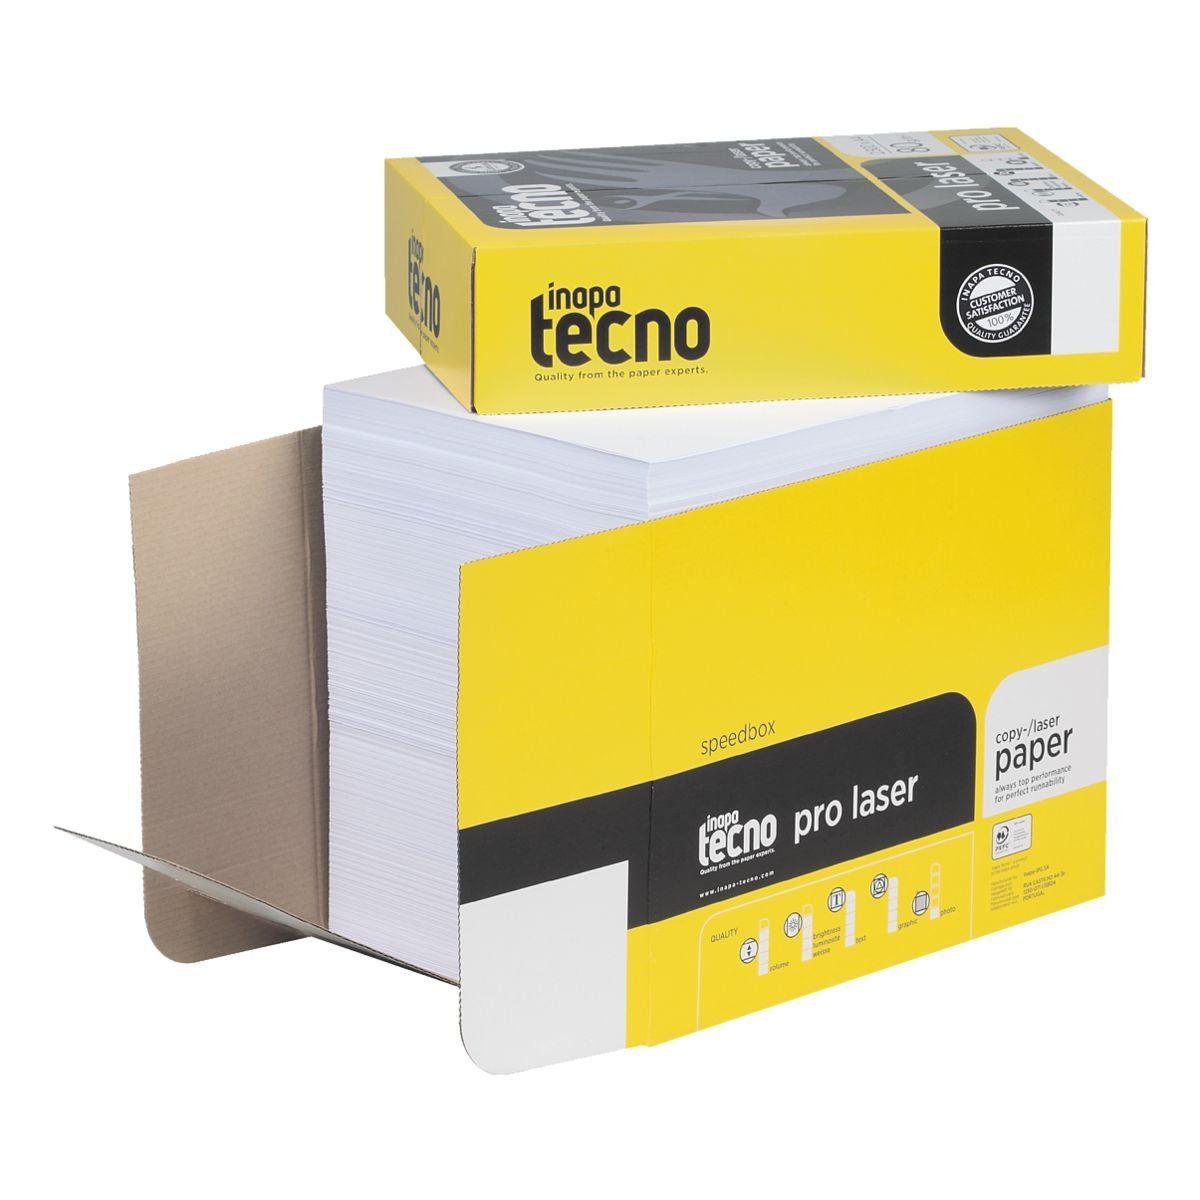 Inapa tecno Öko-Box Multifunktionales Druckerpapier »Pro Laser...